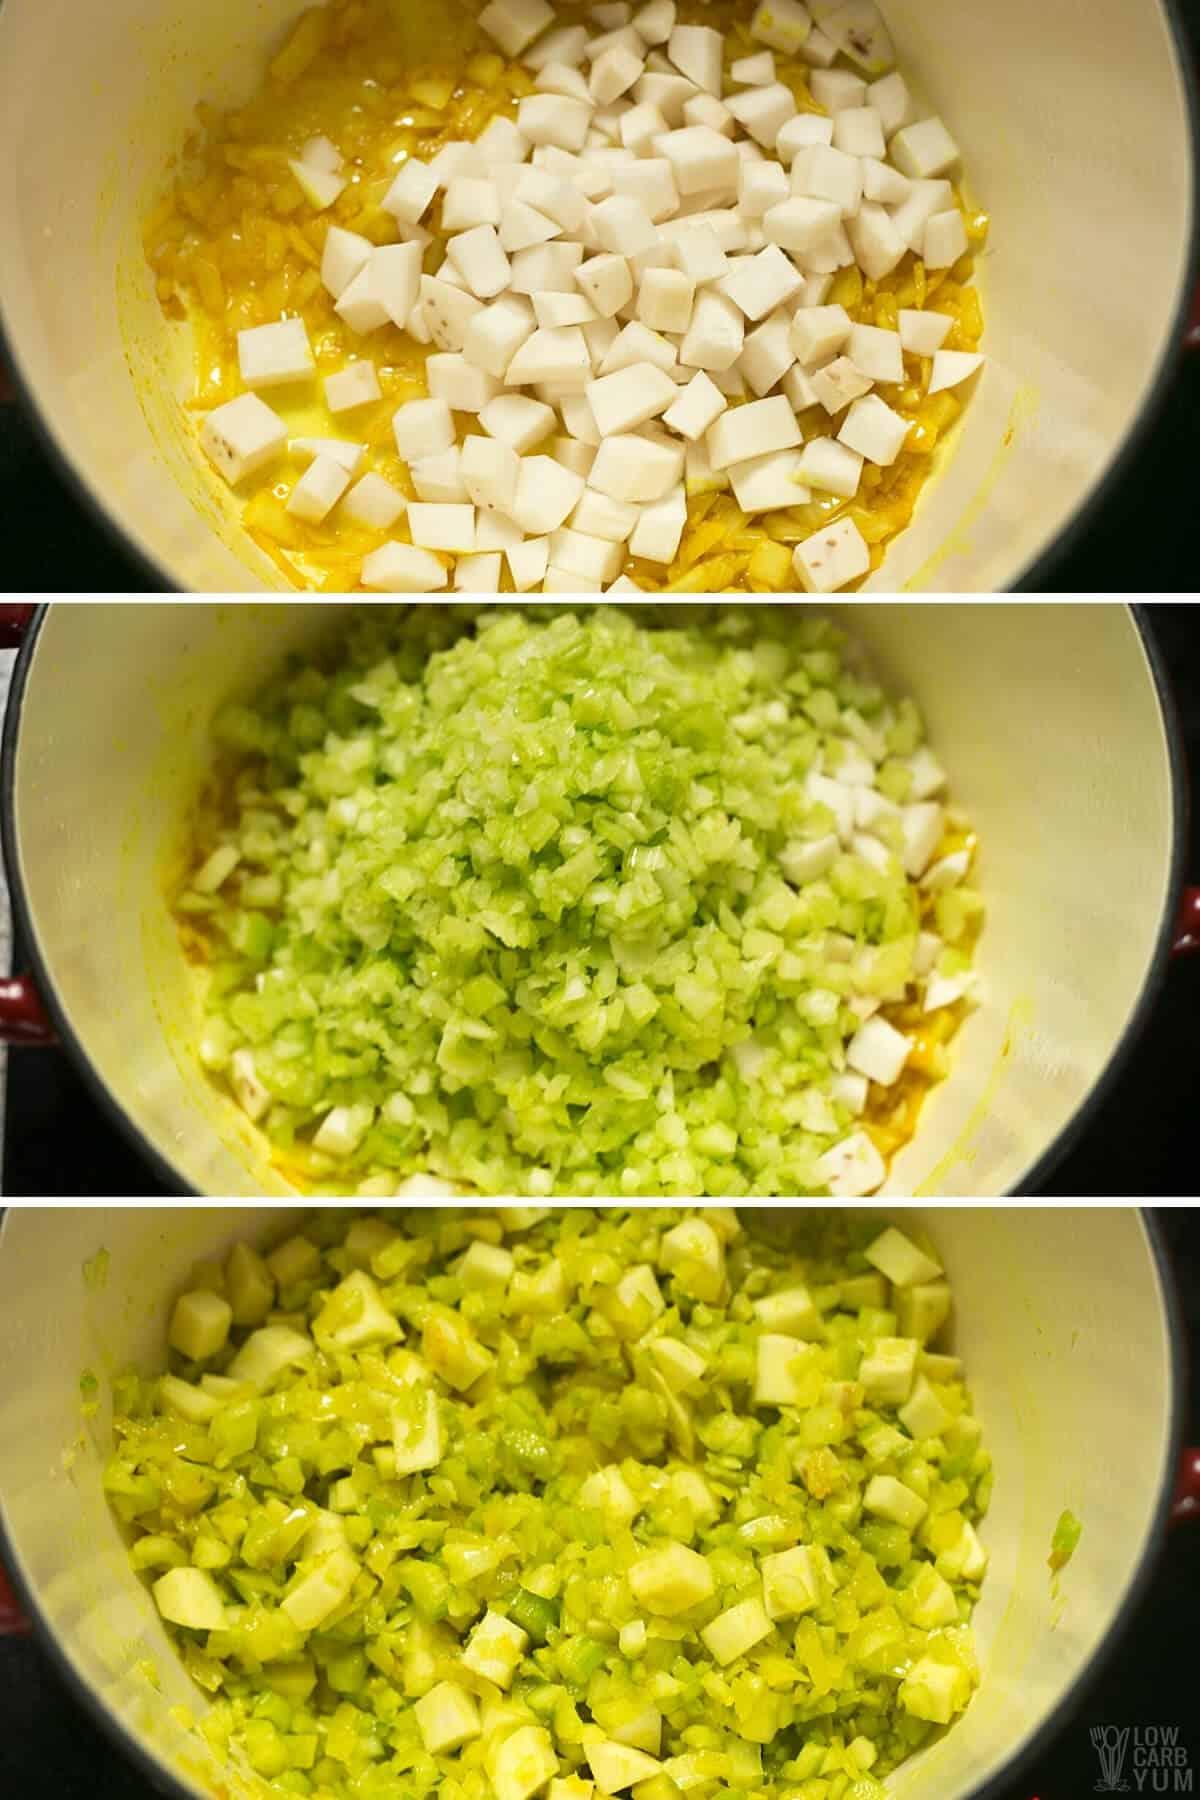 adding chopped turnip and celery